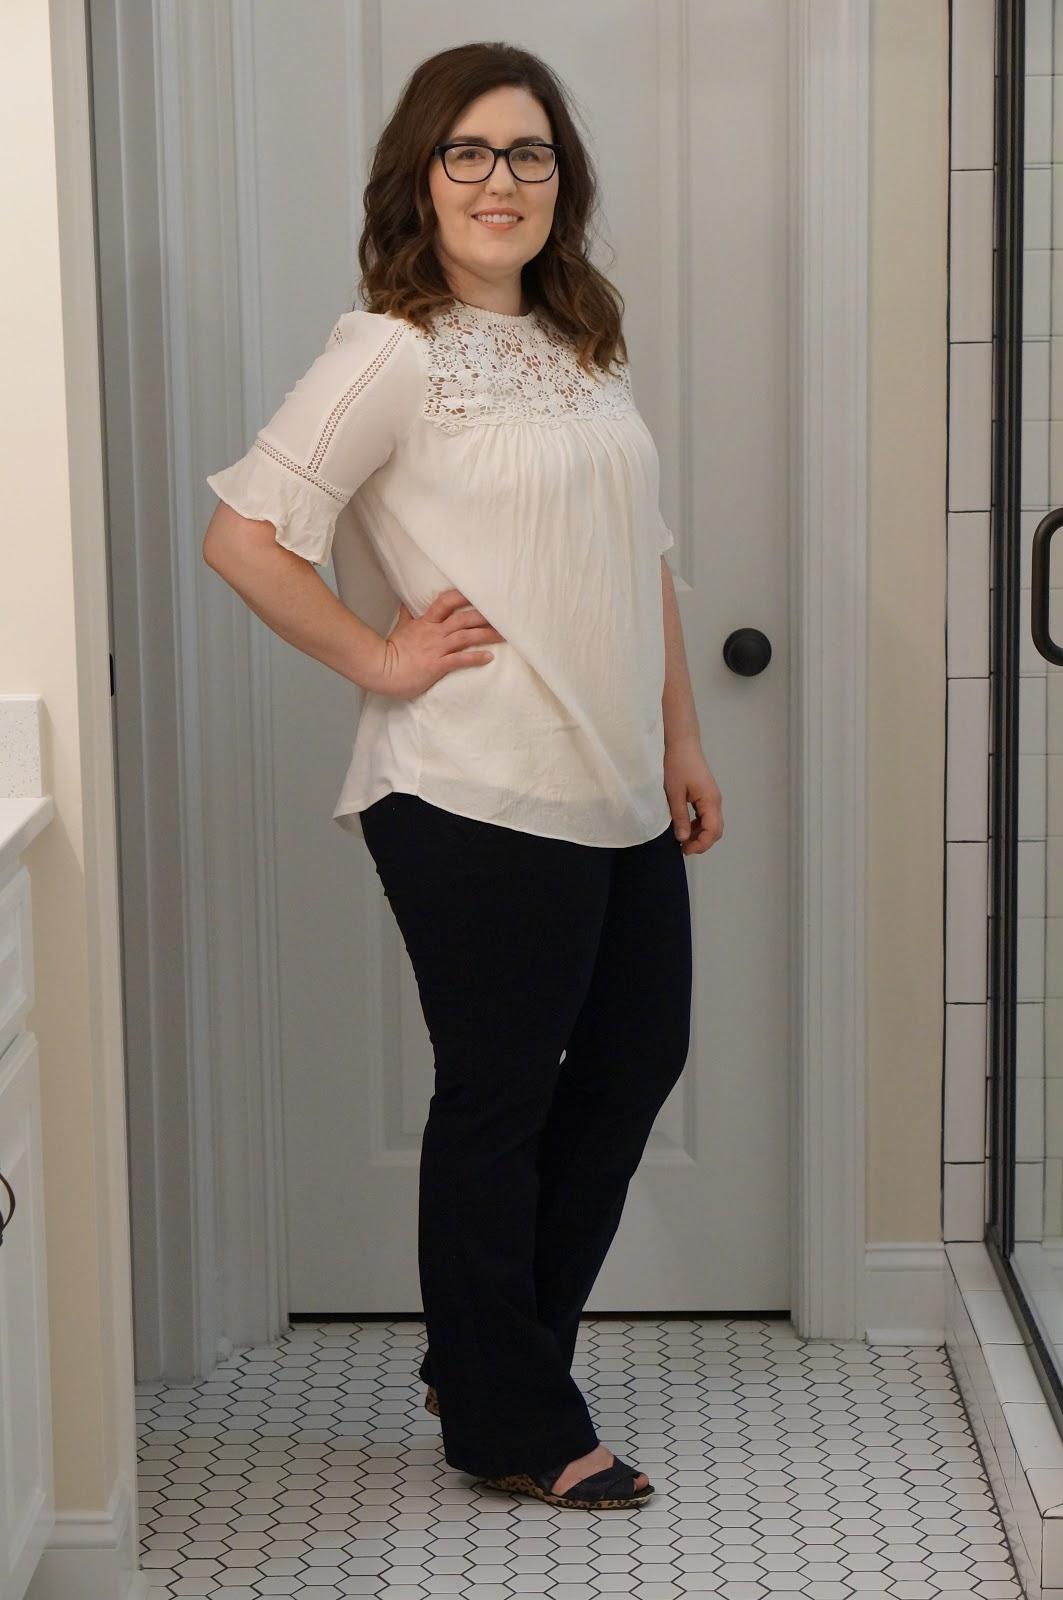 Rebecca Lately Transitional Fall Styles Loft Lace Yoke Top Old Navy Mid-Rise Khakis - FALL FASHION by North Carolina fashion blogger Rebecca Lately